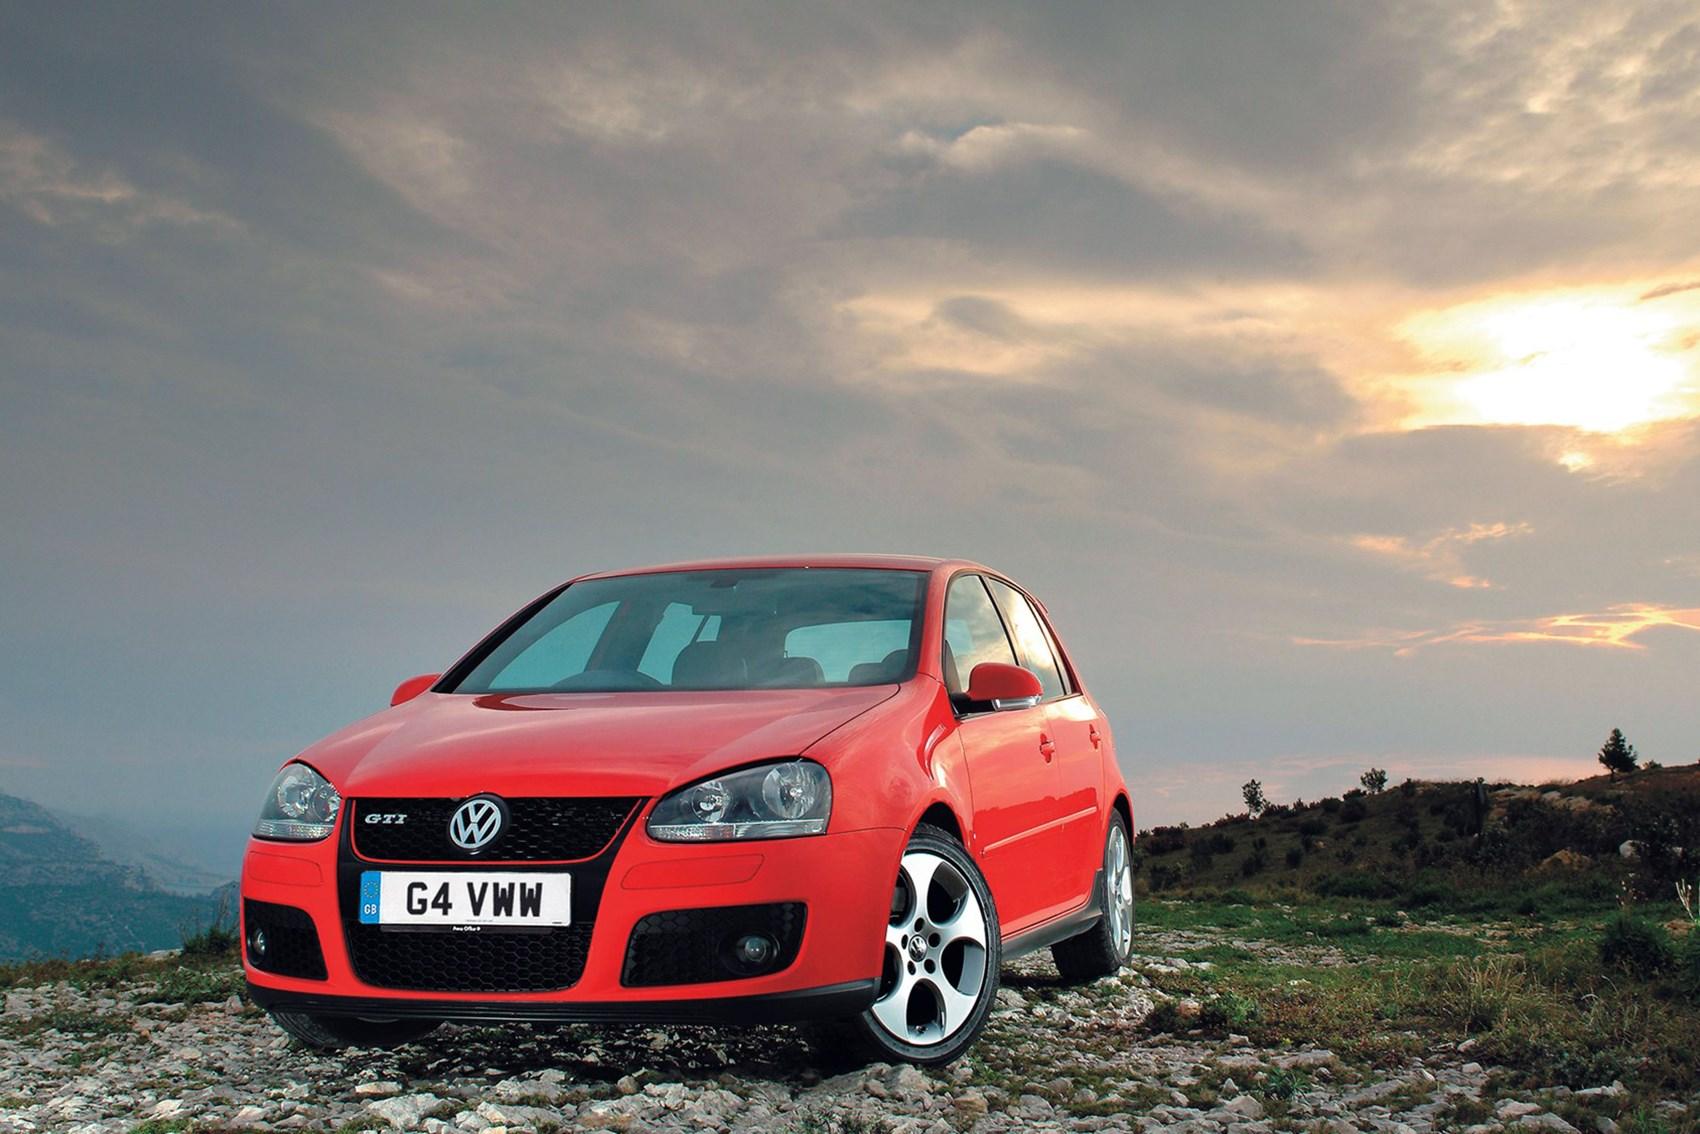 Used Subaru Impreza Hatchback >> Used hot hatchbacks for less than £8k | Parkers